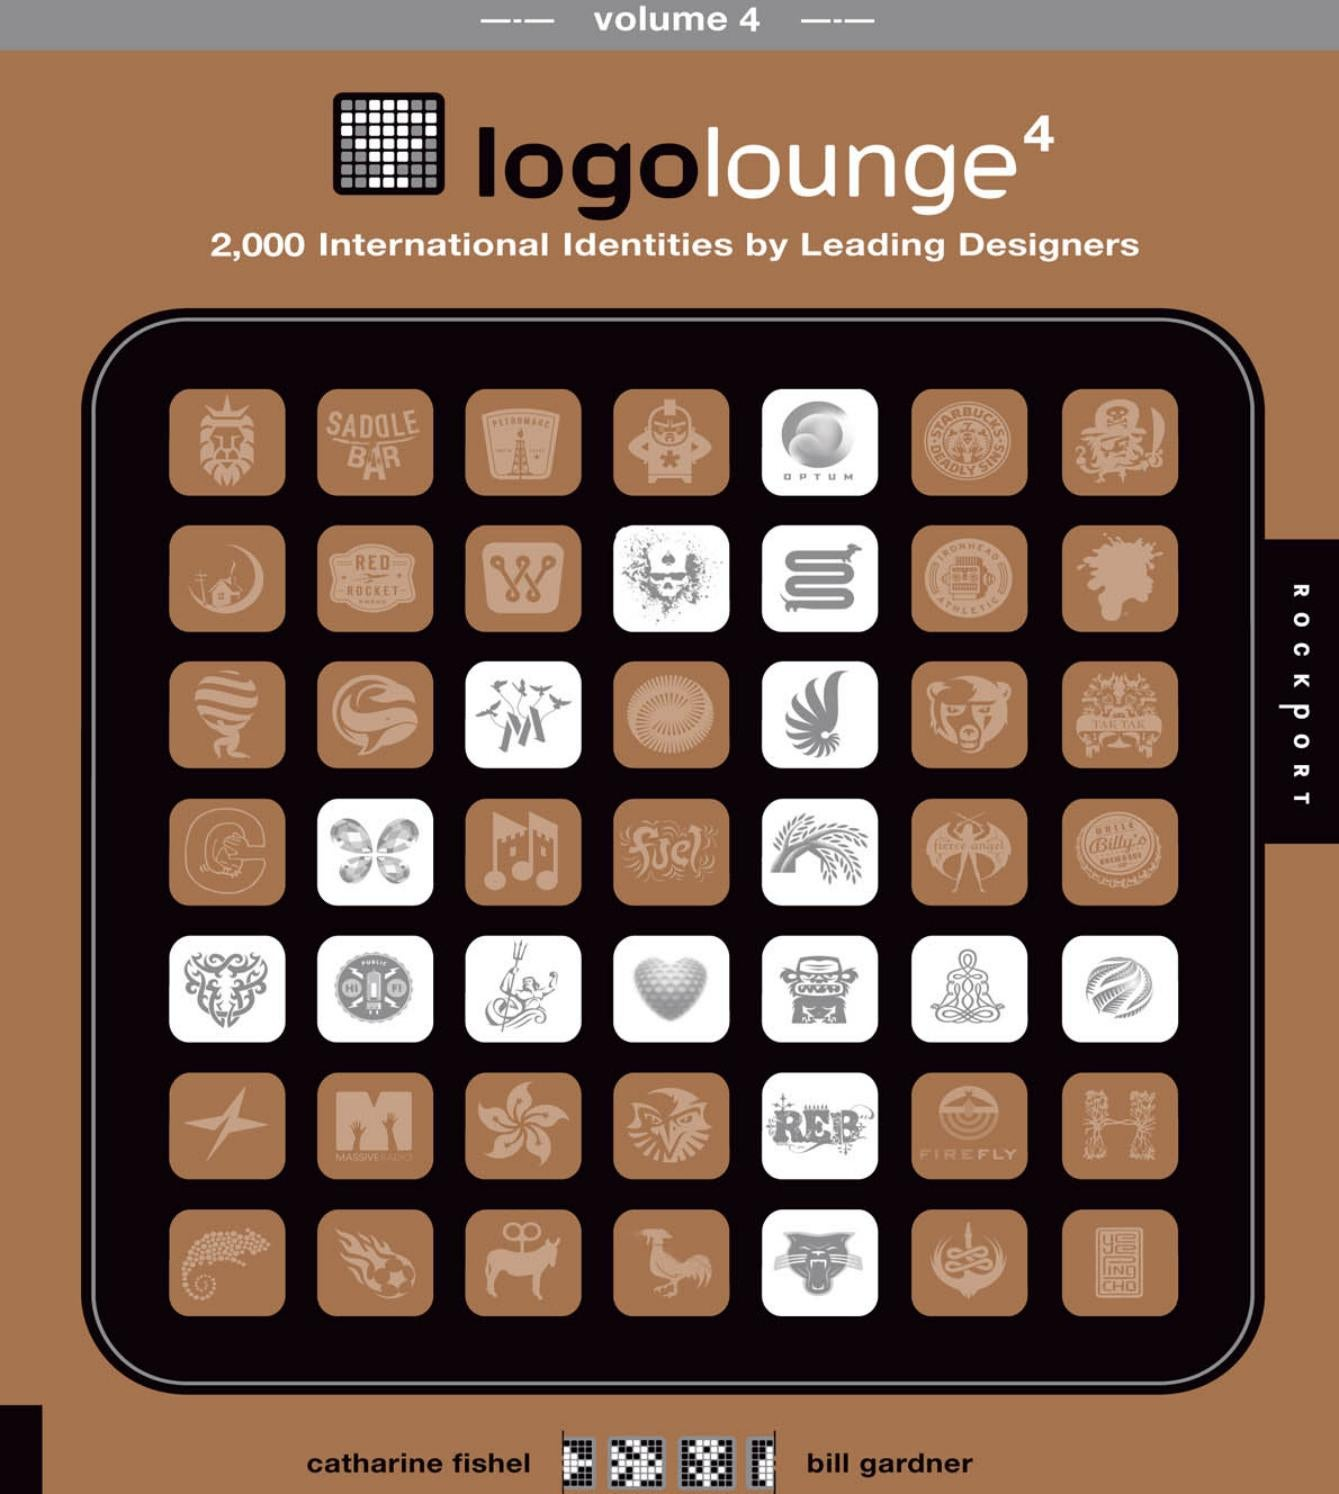 Logolounge 4 by Sobral - issuu